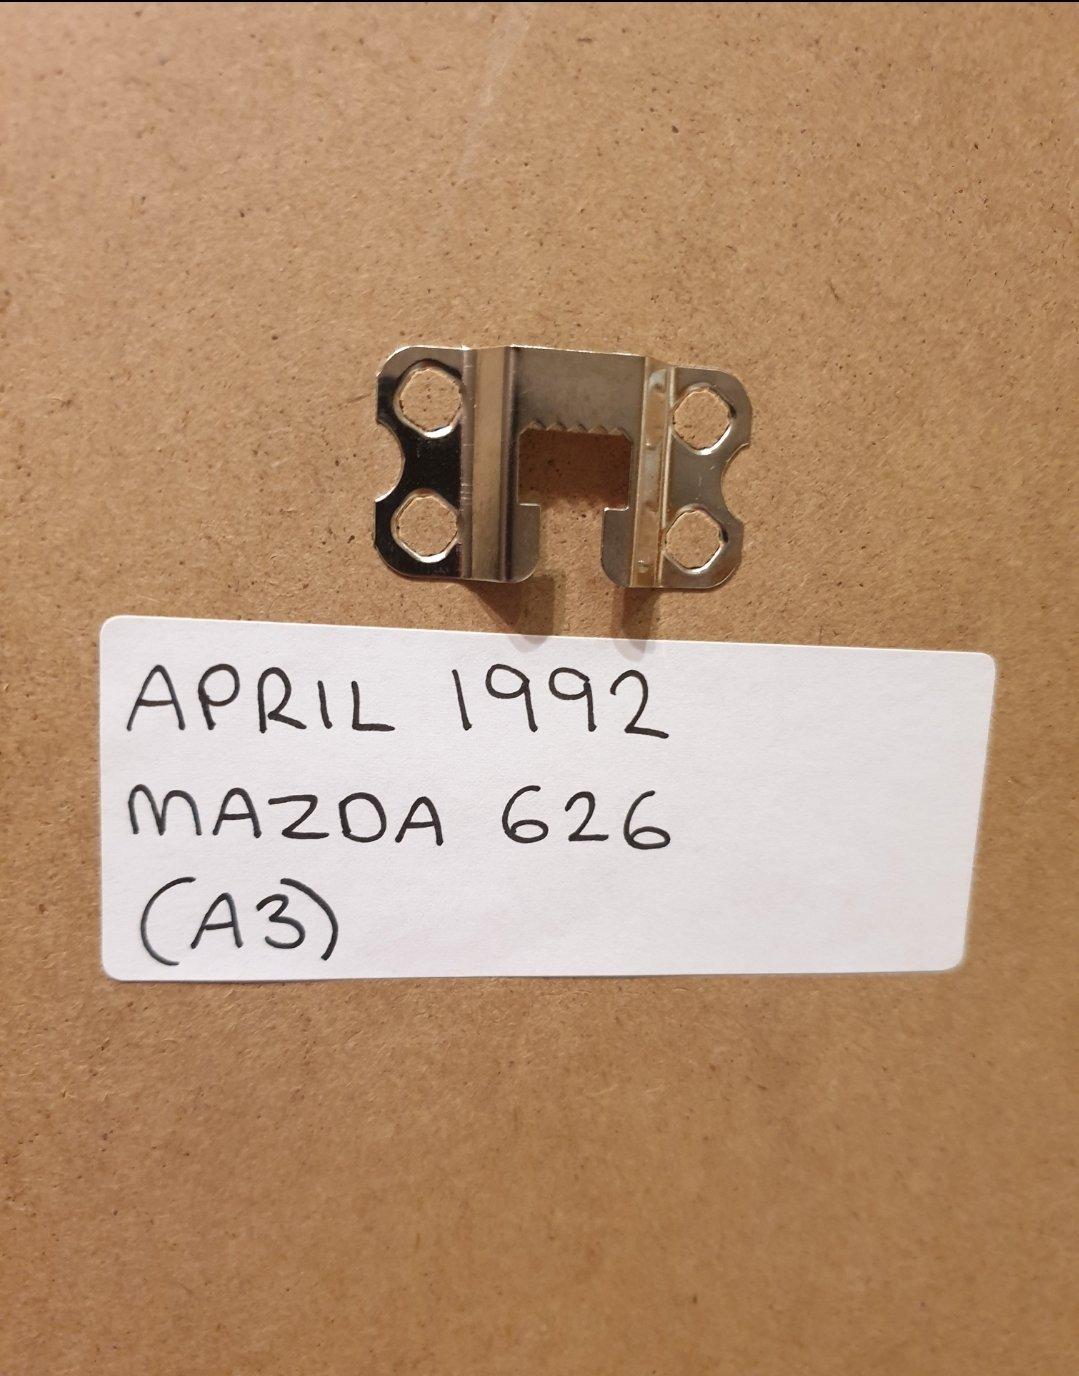 1992 Mazda 626 Framed Advert Original  For Sale (picture 2 of 3)